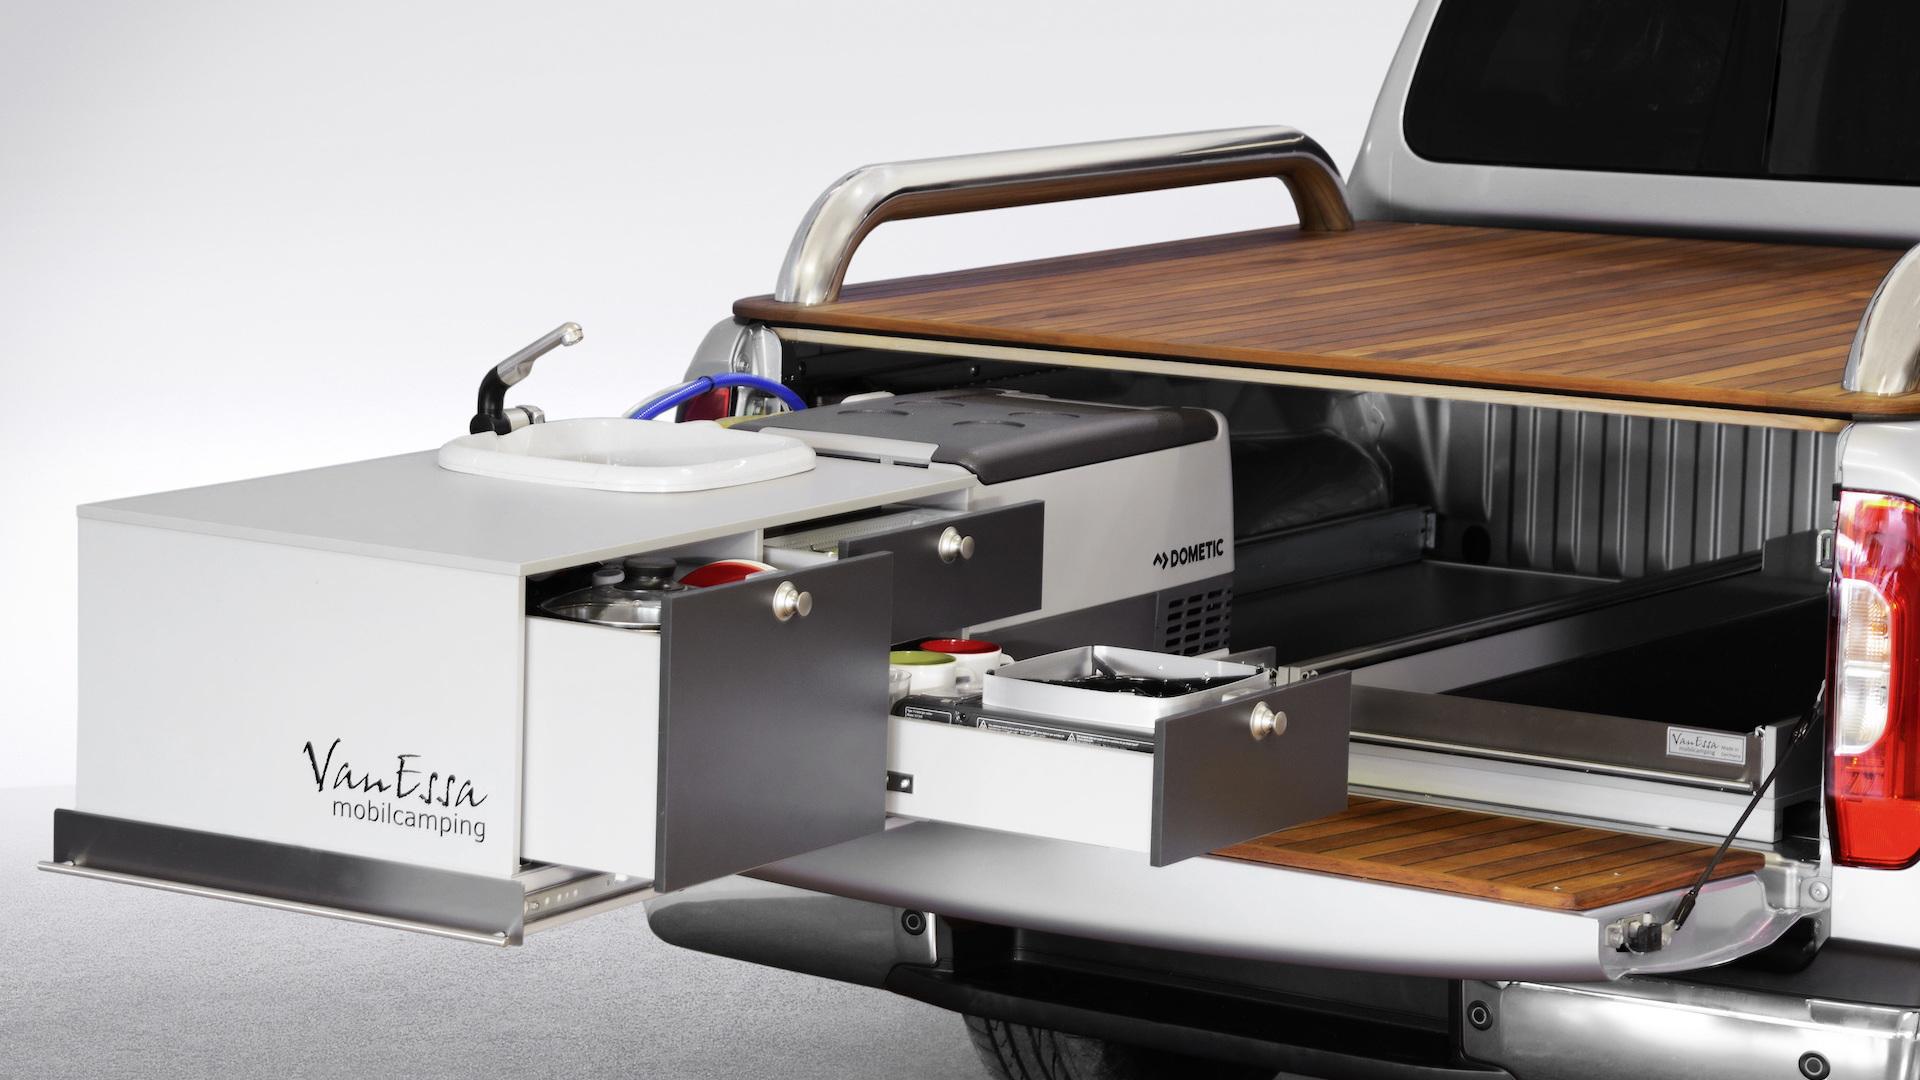 Mercedes-Benz X-Class camper concept